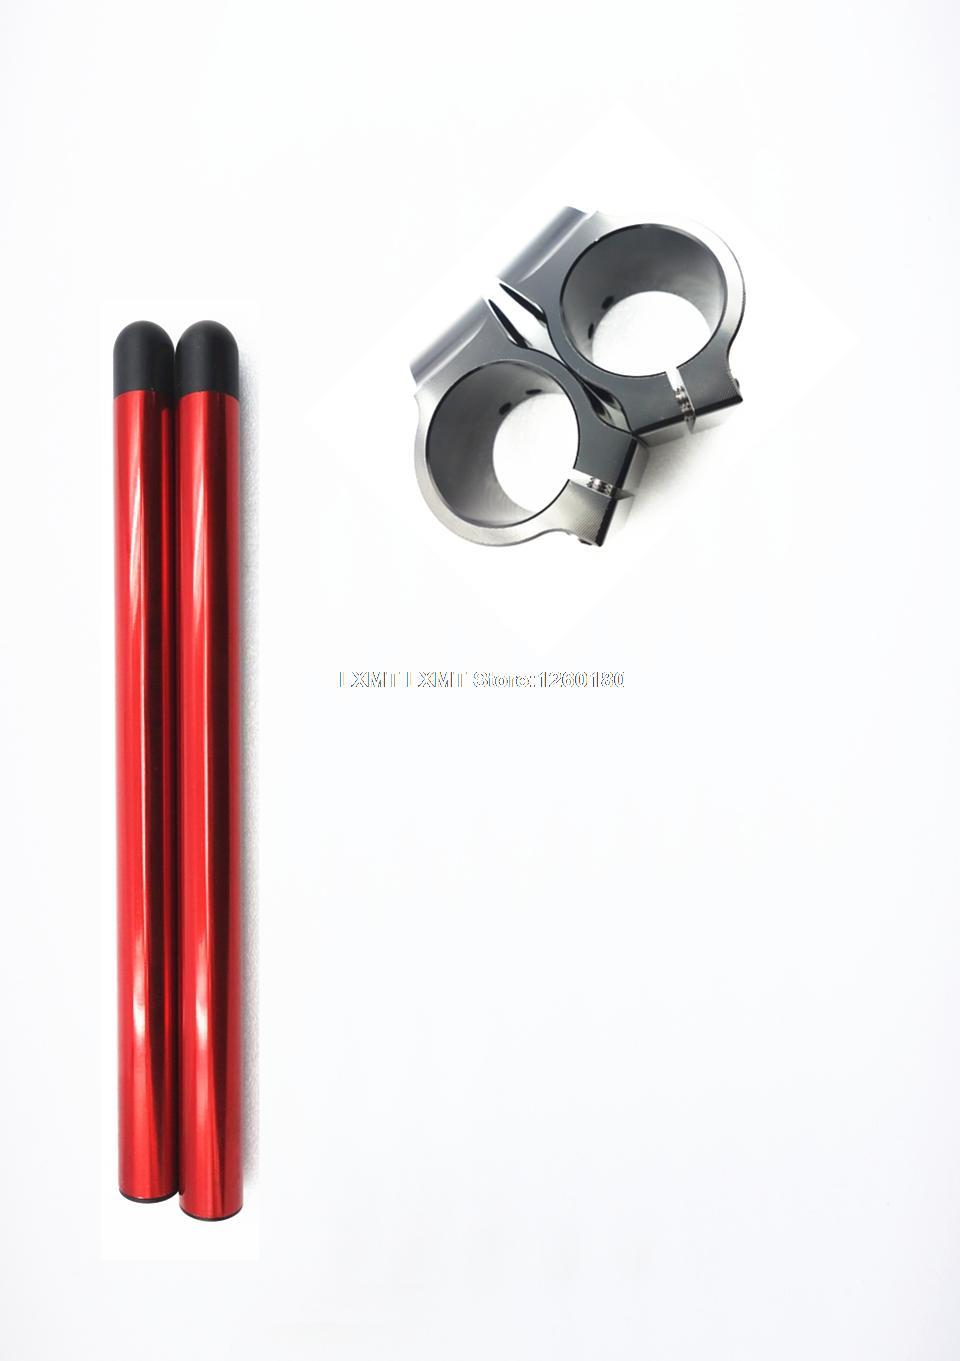 Billet Higher Raised Raised Clip On Ons Clipon Fork Handle Bars fit MASSEY FERGUSON MF 700 D/4WD Auto (686cc Diesel) 2005 - 2008(China (Mainland))